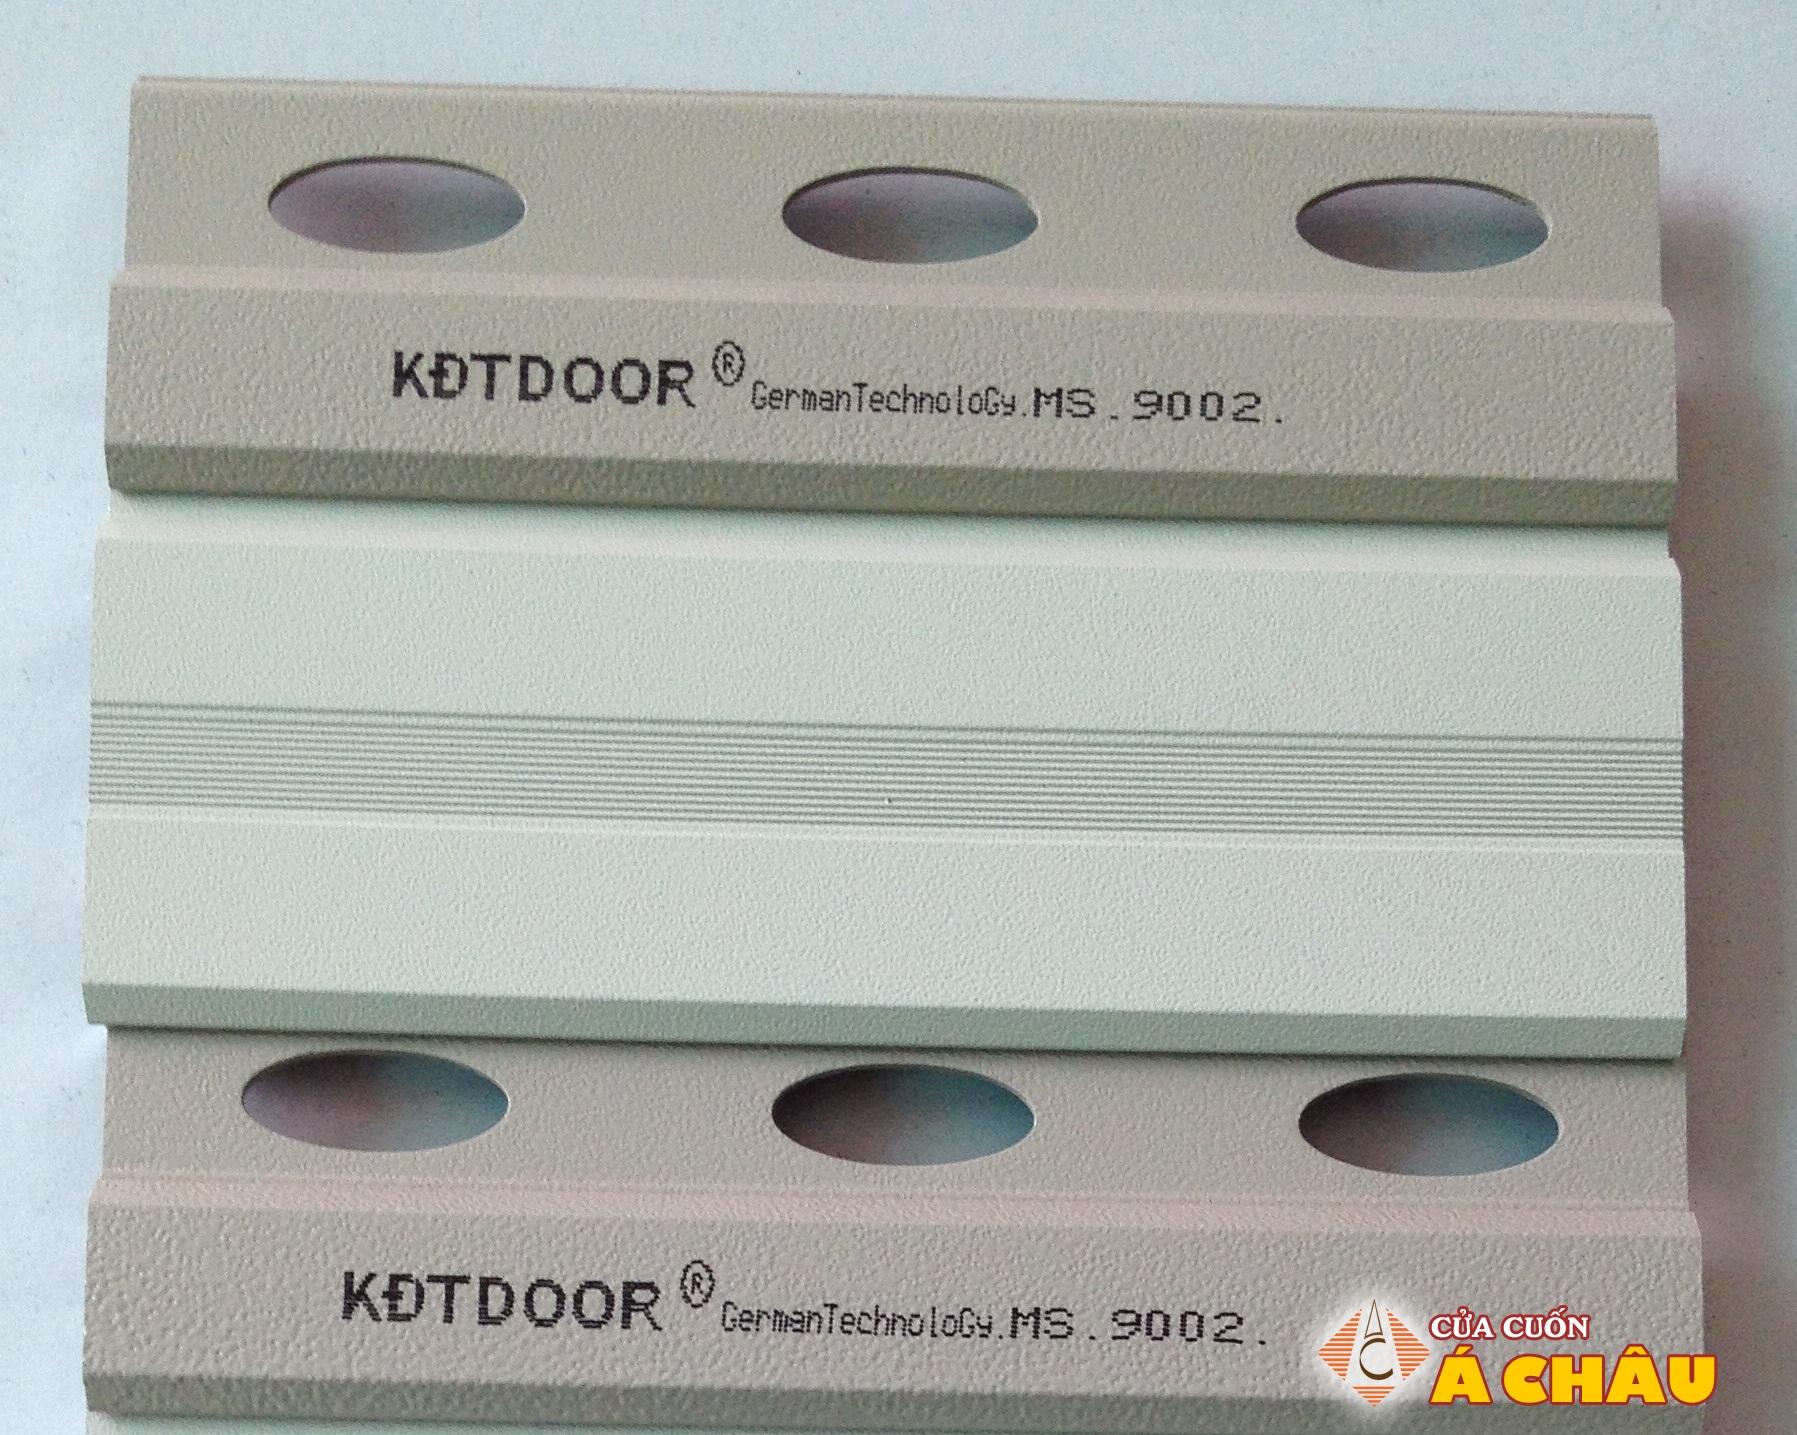 Cửa cuốn Đức Alludoor KDT 9002